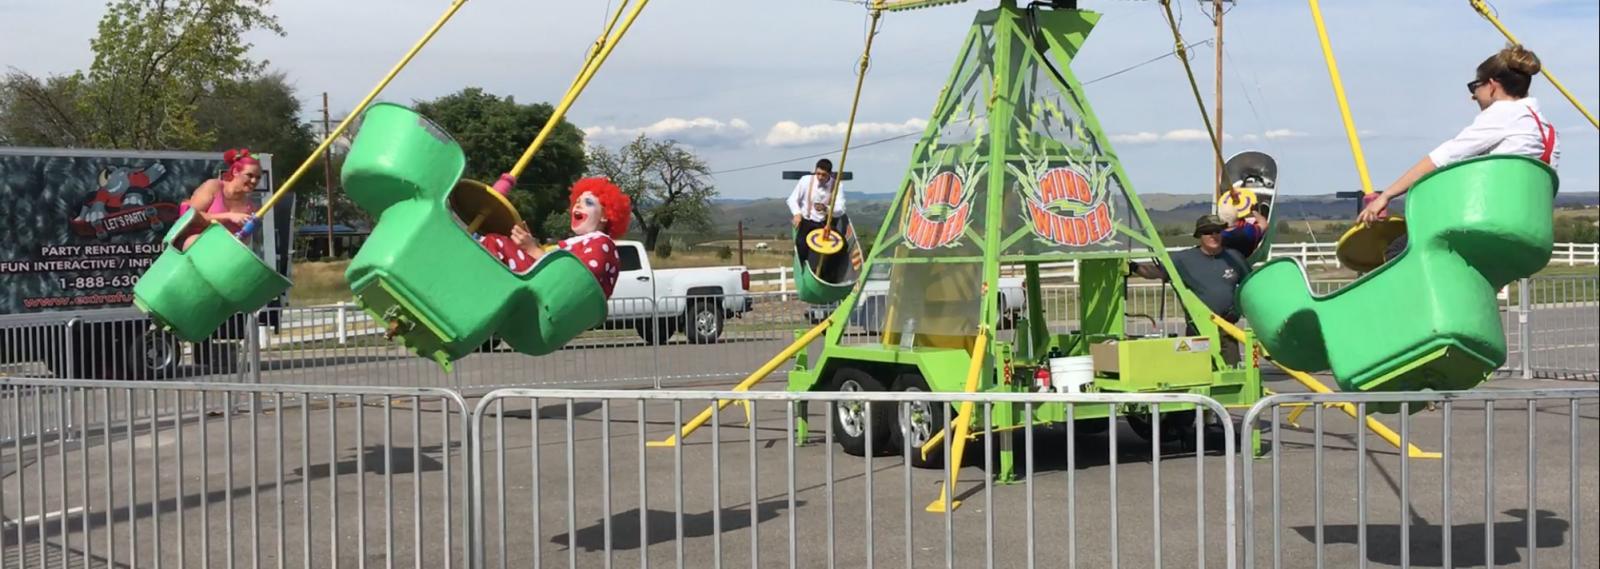 Mindwinder Carnival Spinning Ride